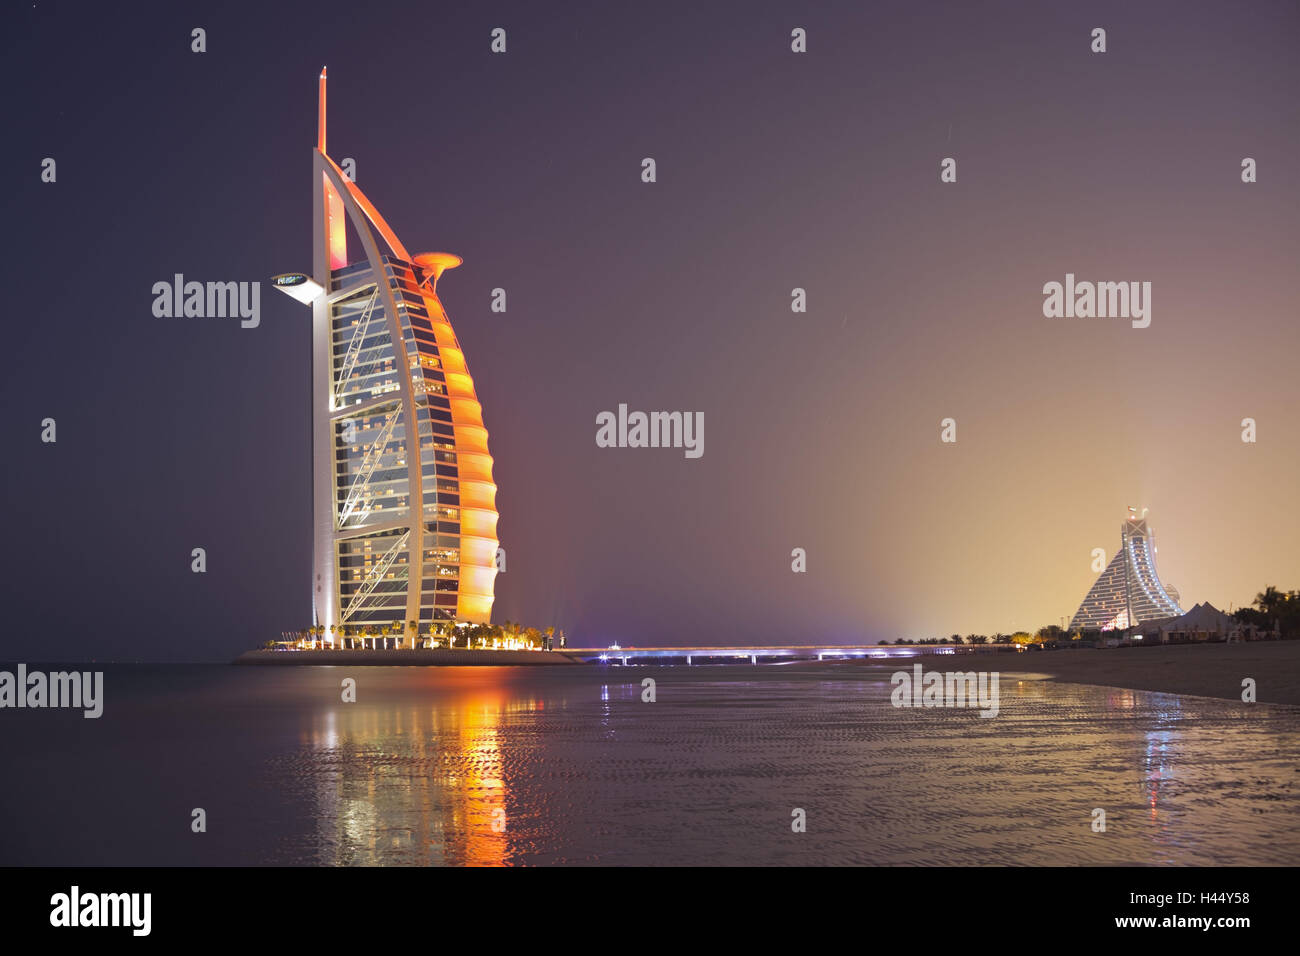 Emirati Arabi Uniti Dubai Burj Al Arab, atmosfera serale, Immagini Stock